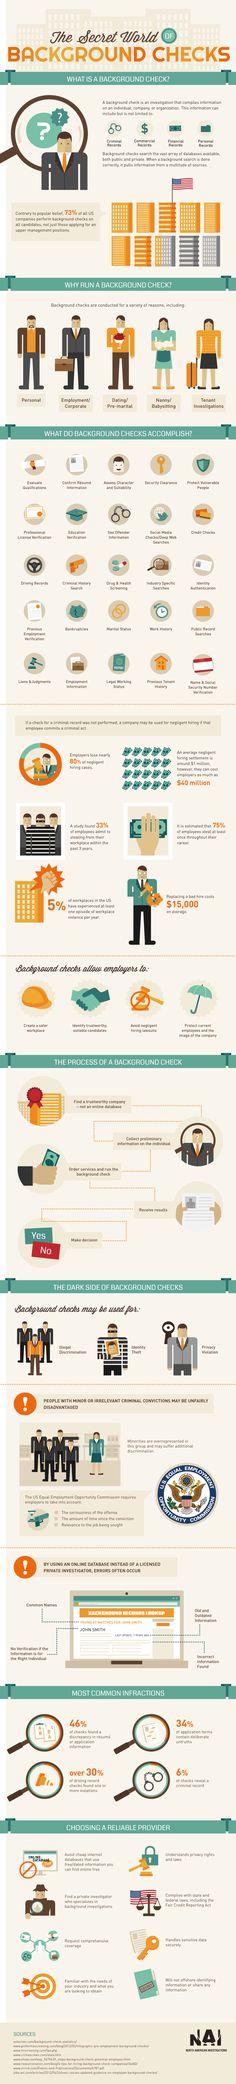 The Secret World Of Background Checks   #Infographic #BackgroundChecks #corporation